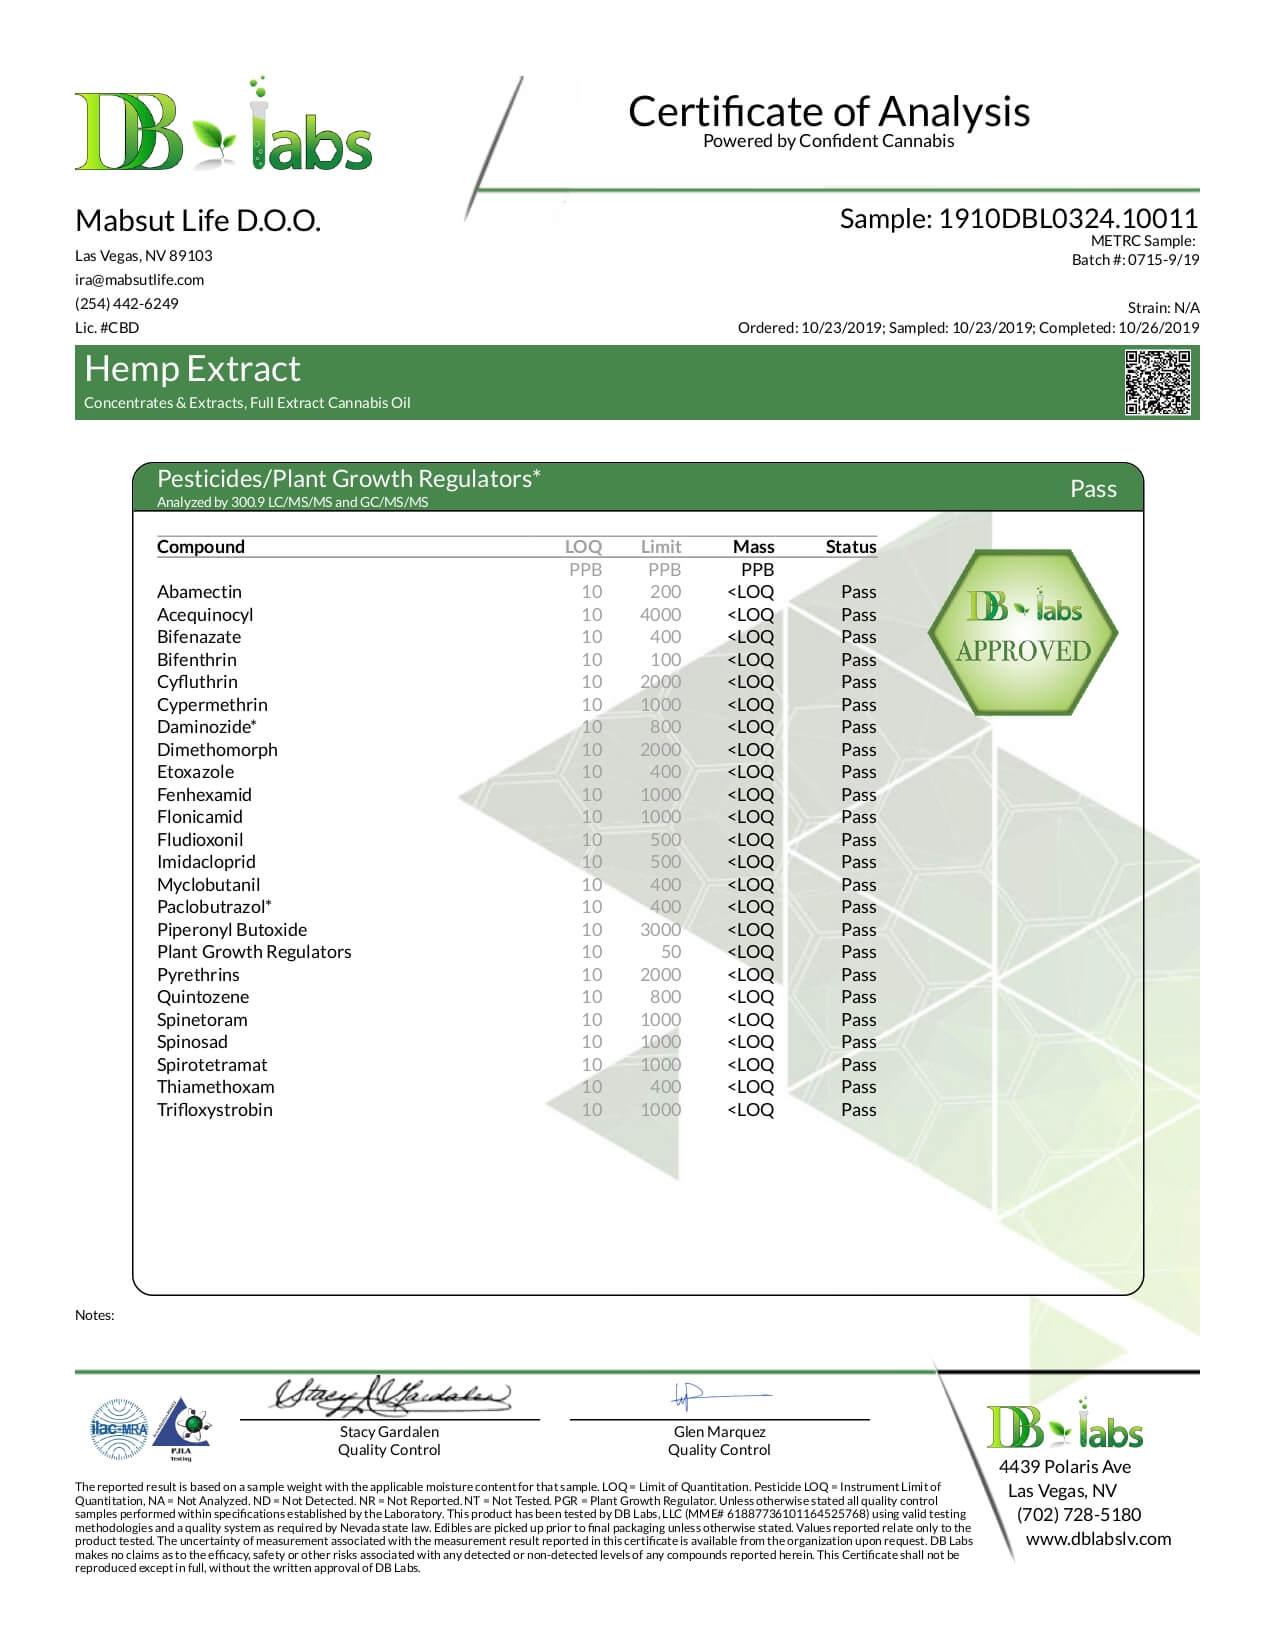 PhenoPen CBD Cartidge PhenoPen Cartridge Lab Report